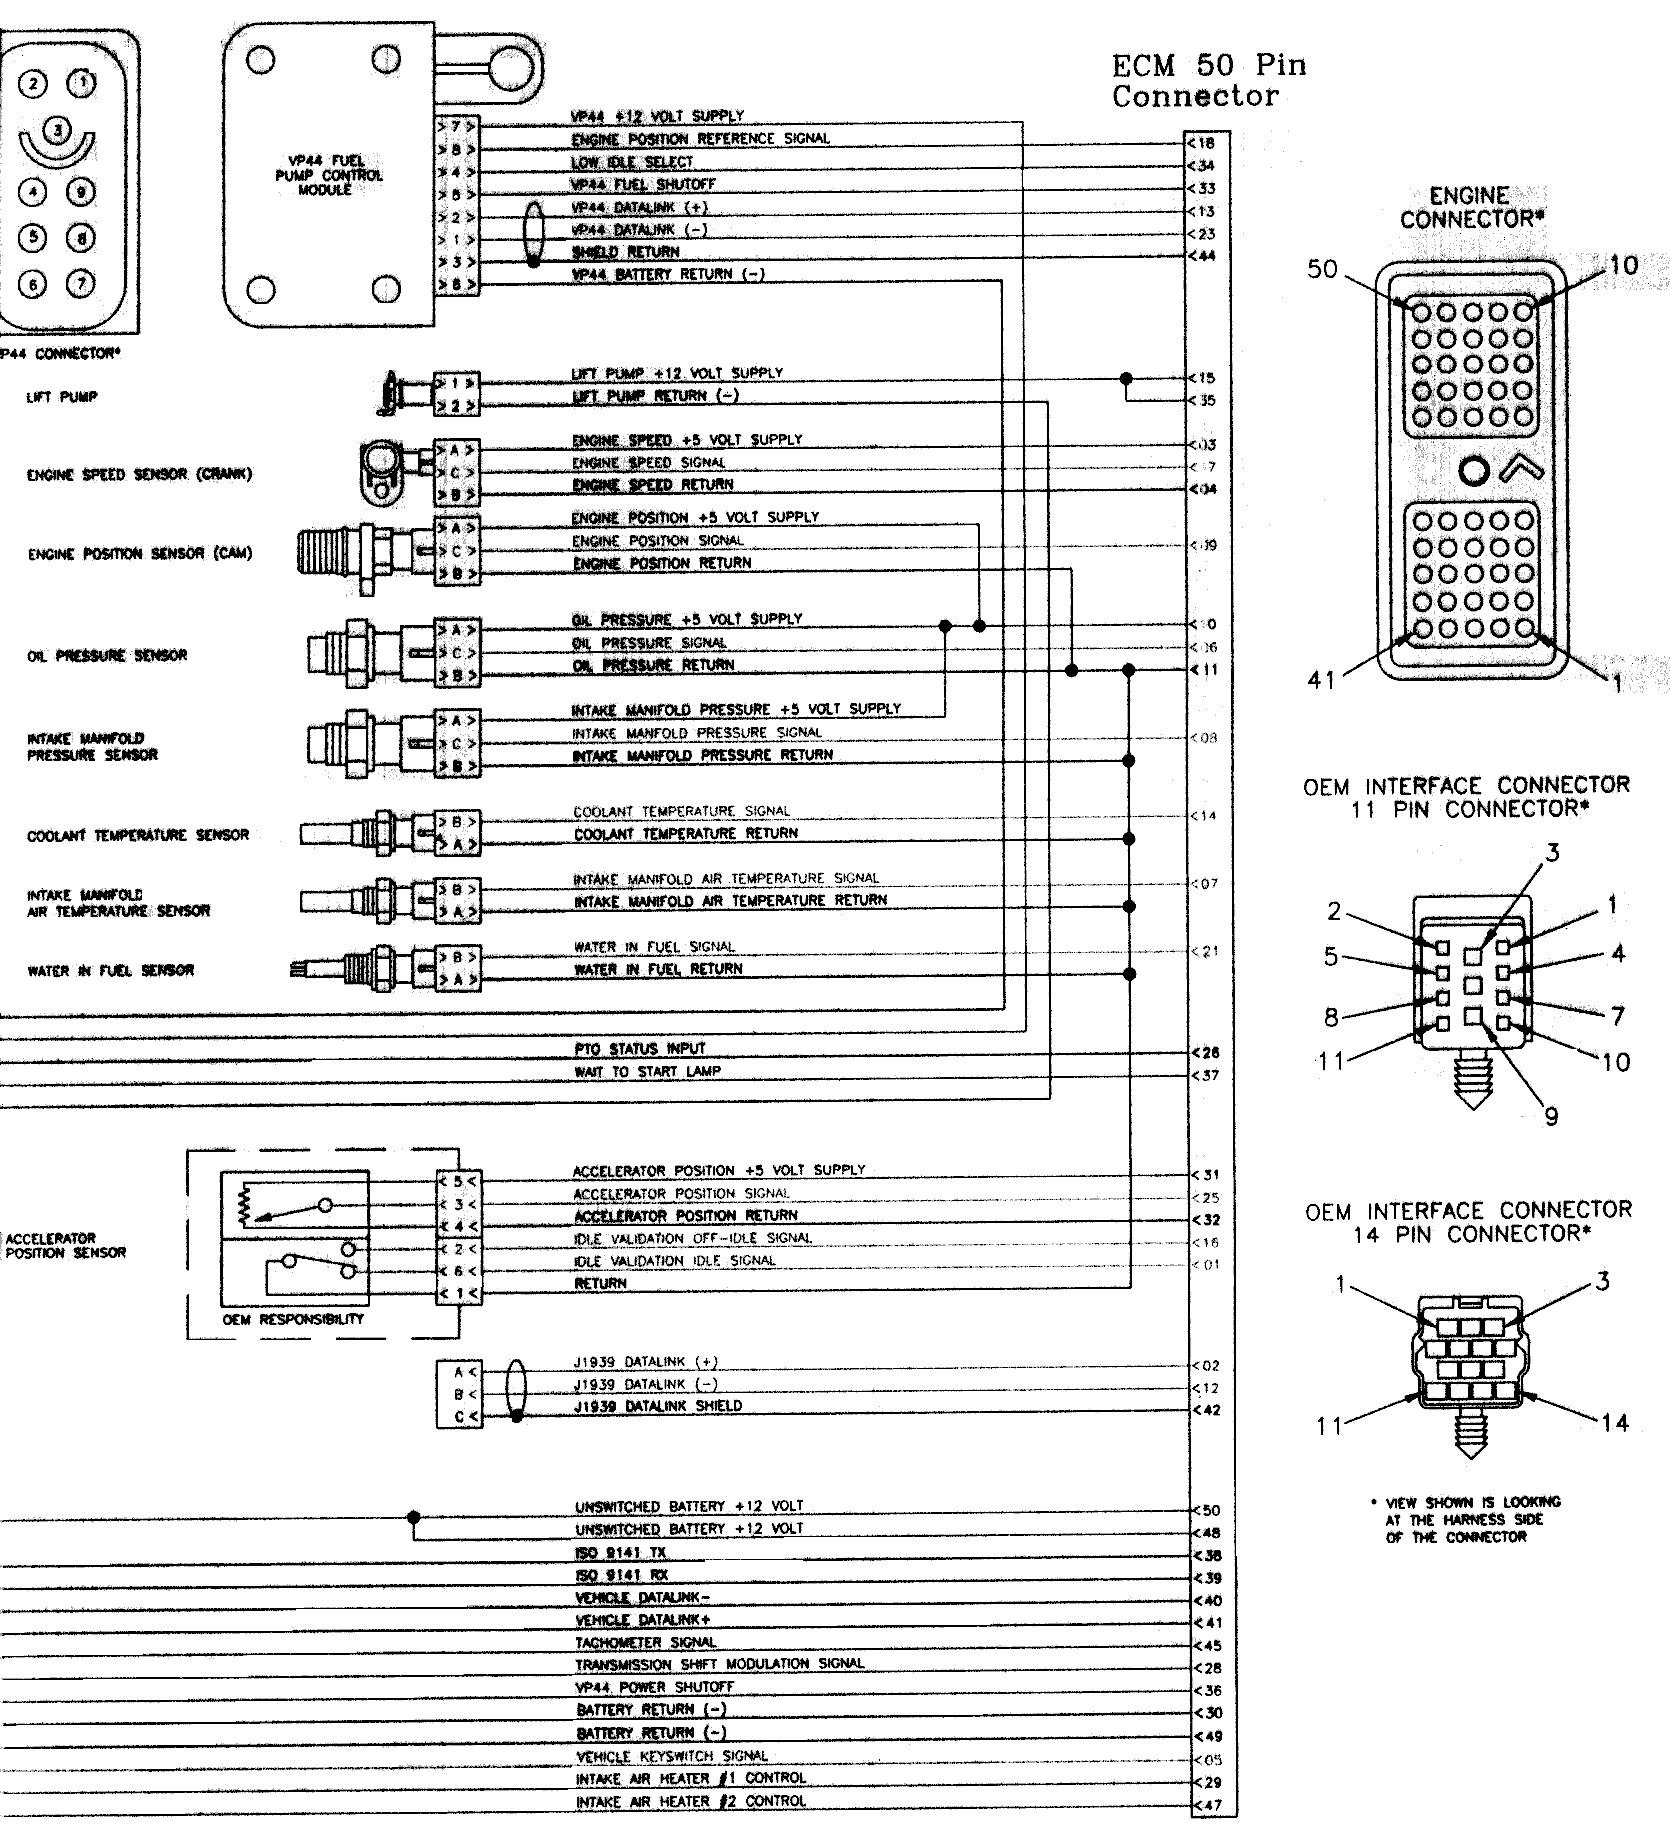 hight resolution of 2005 dodge cummins ecm wiring diagram download ecm details for 1998 2002 dodge ram trucks